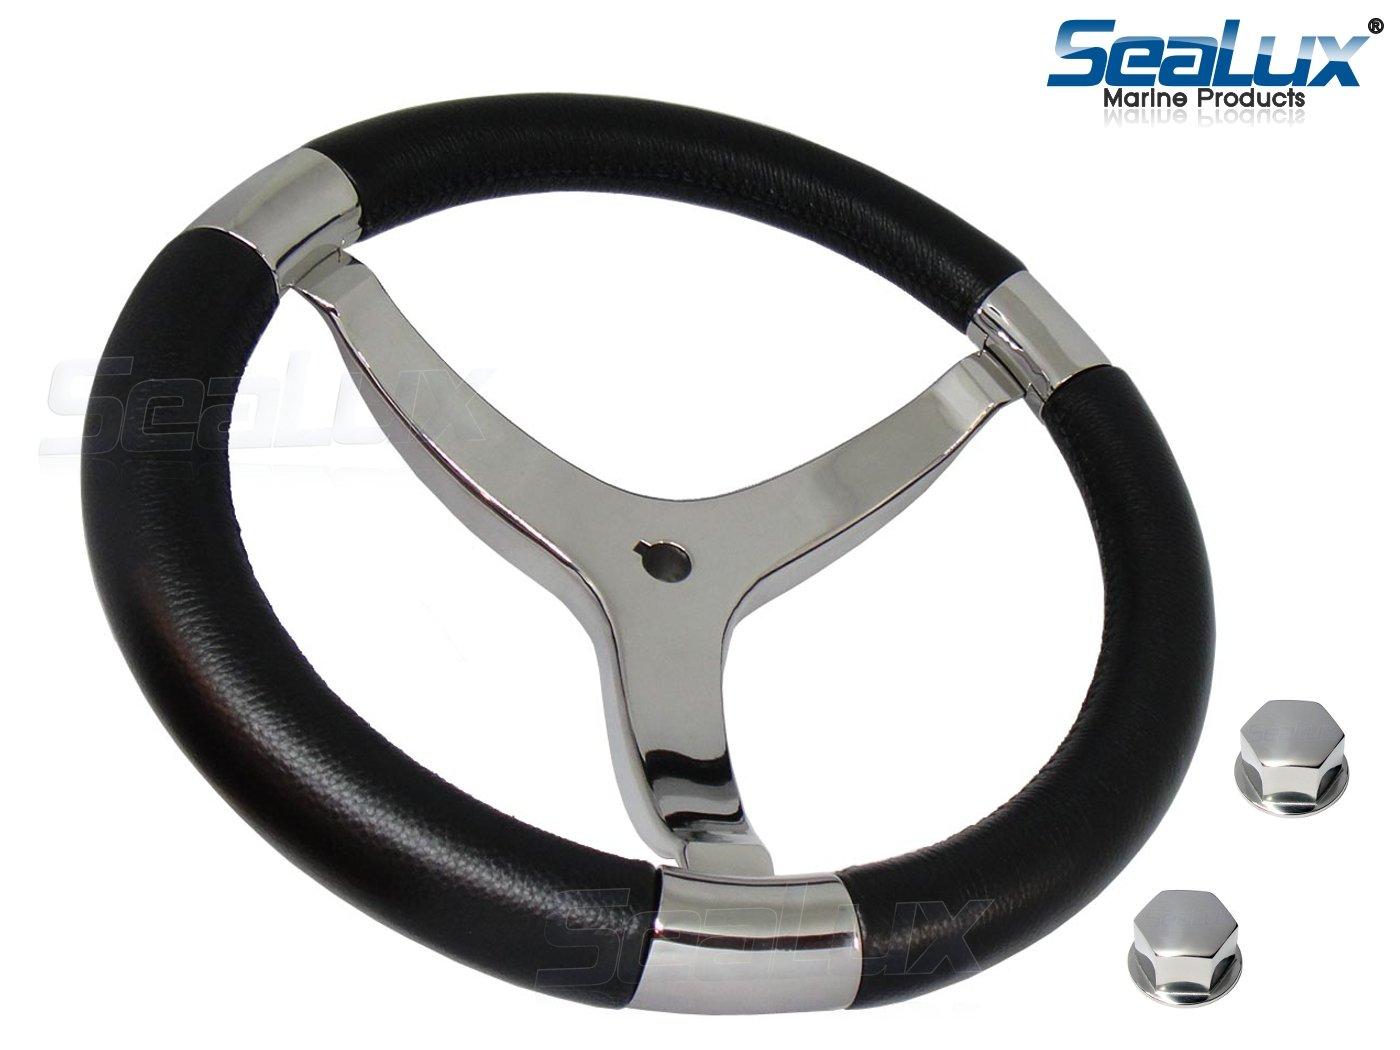 SeaLux Marine Premier Genuine Leather Comfort Grip 316 Stainless Steel 14'' dia. 3-Spoke Sport Boat Yacht Steering Wheel (Color Black) by SeaLux Marine Products